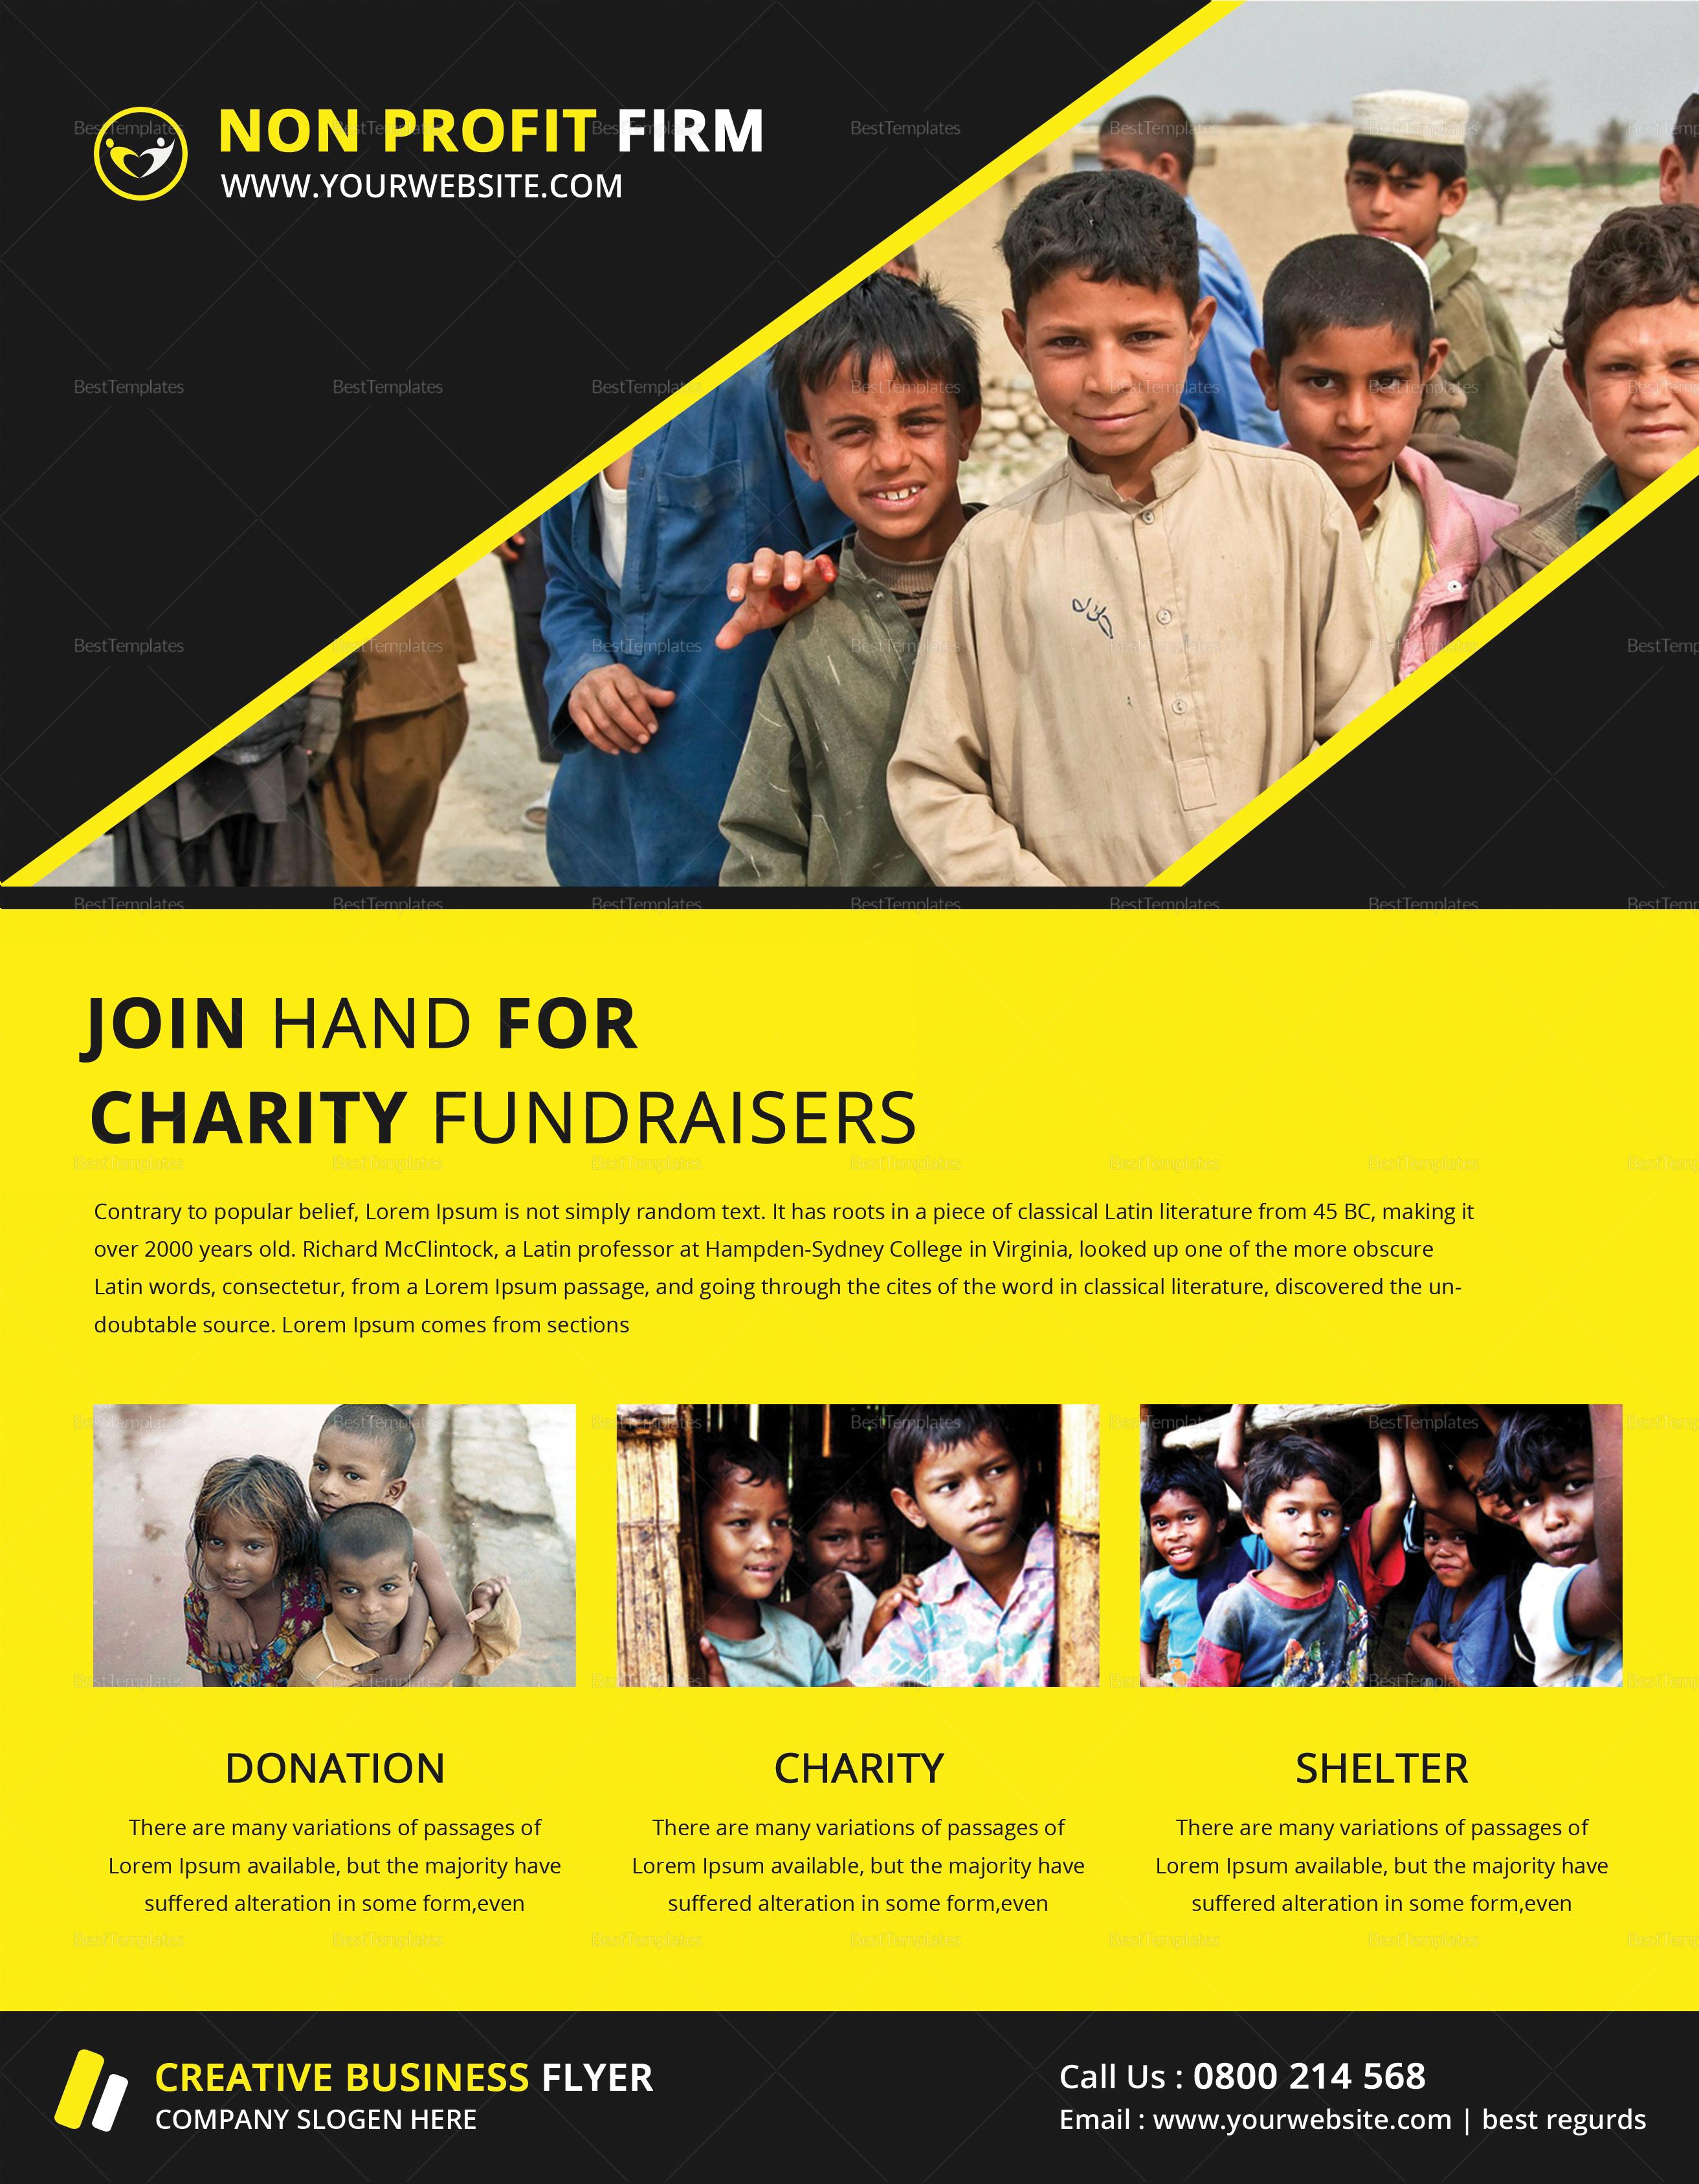 Charity Fundraiser Church Flyer Design Template